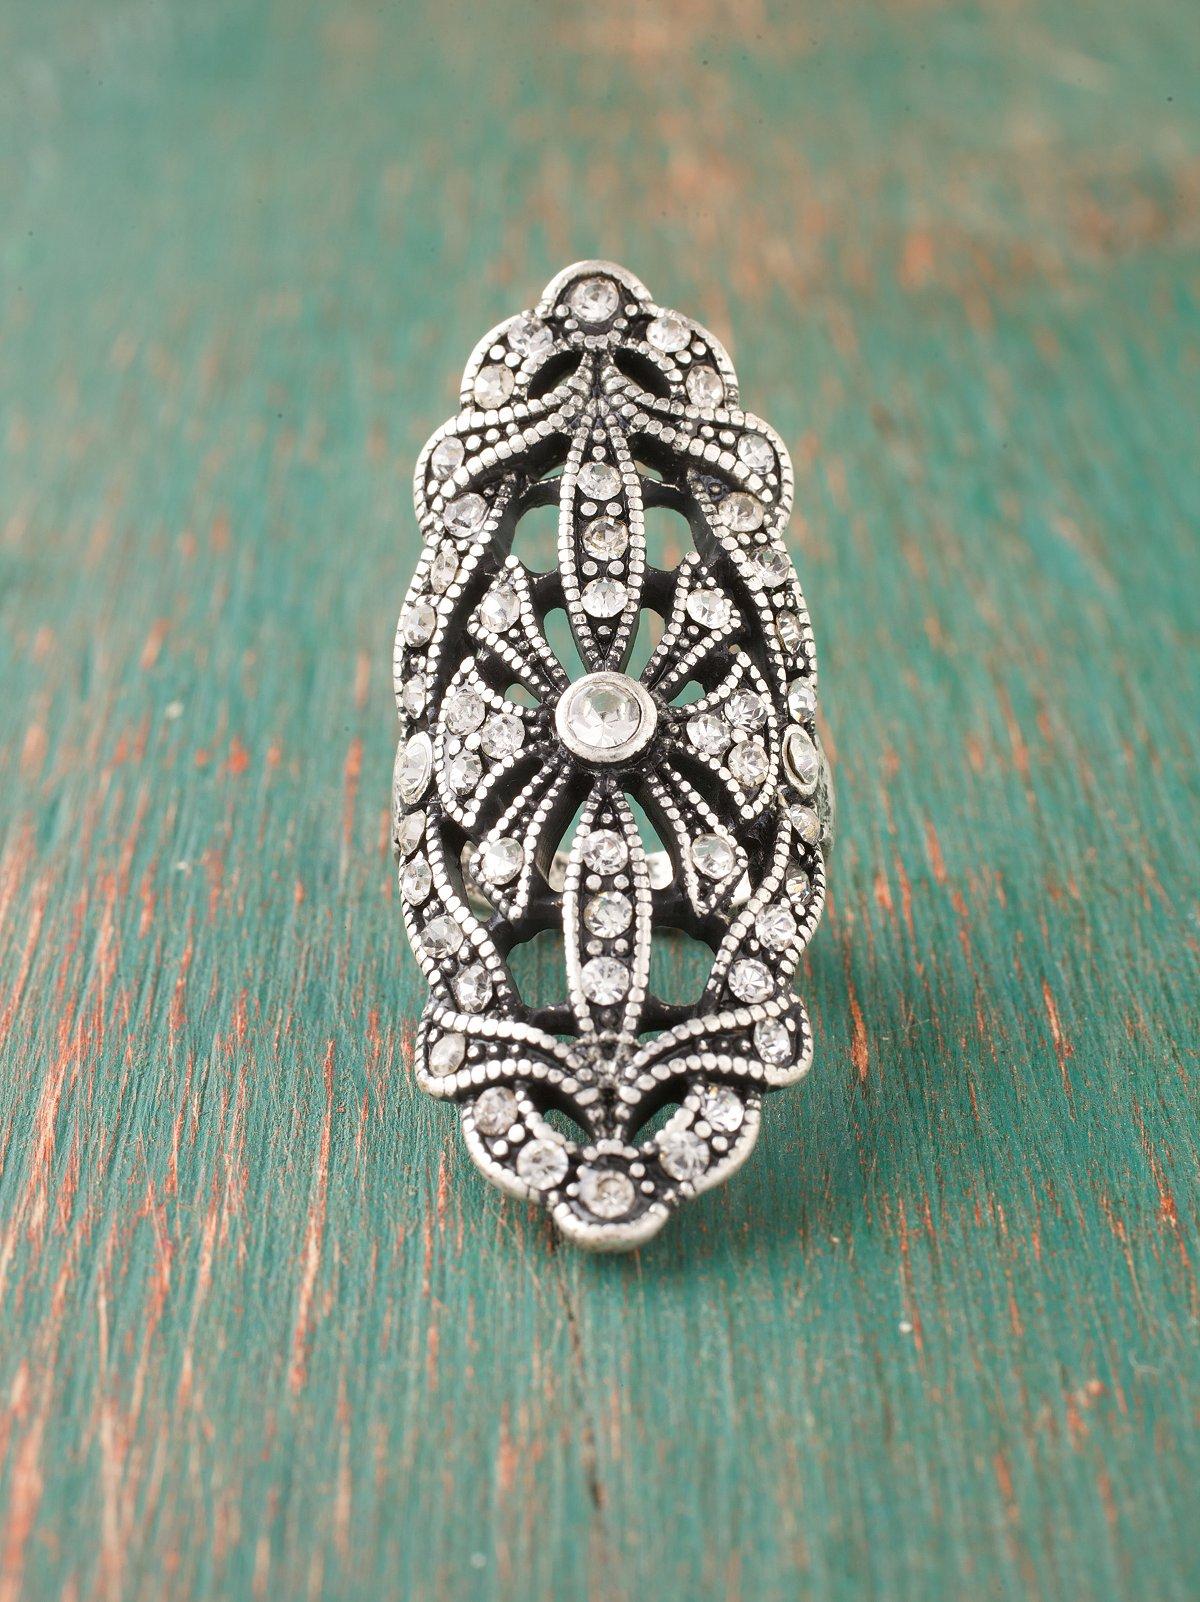 Rhinestone Crest Ring